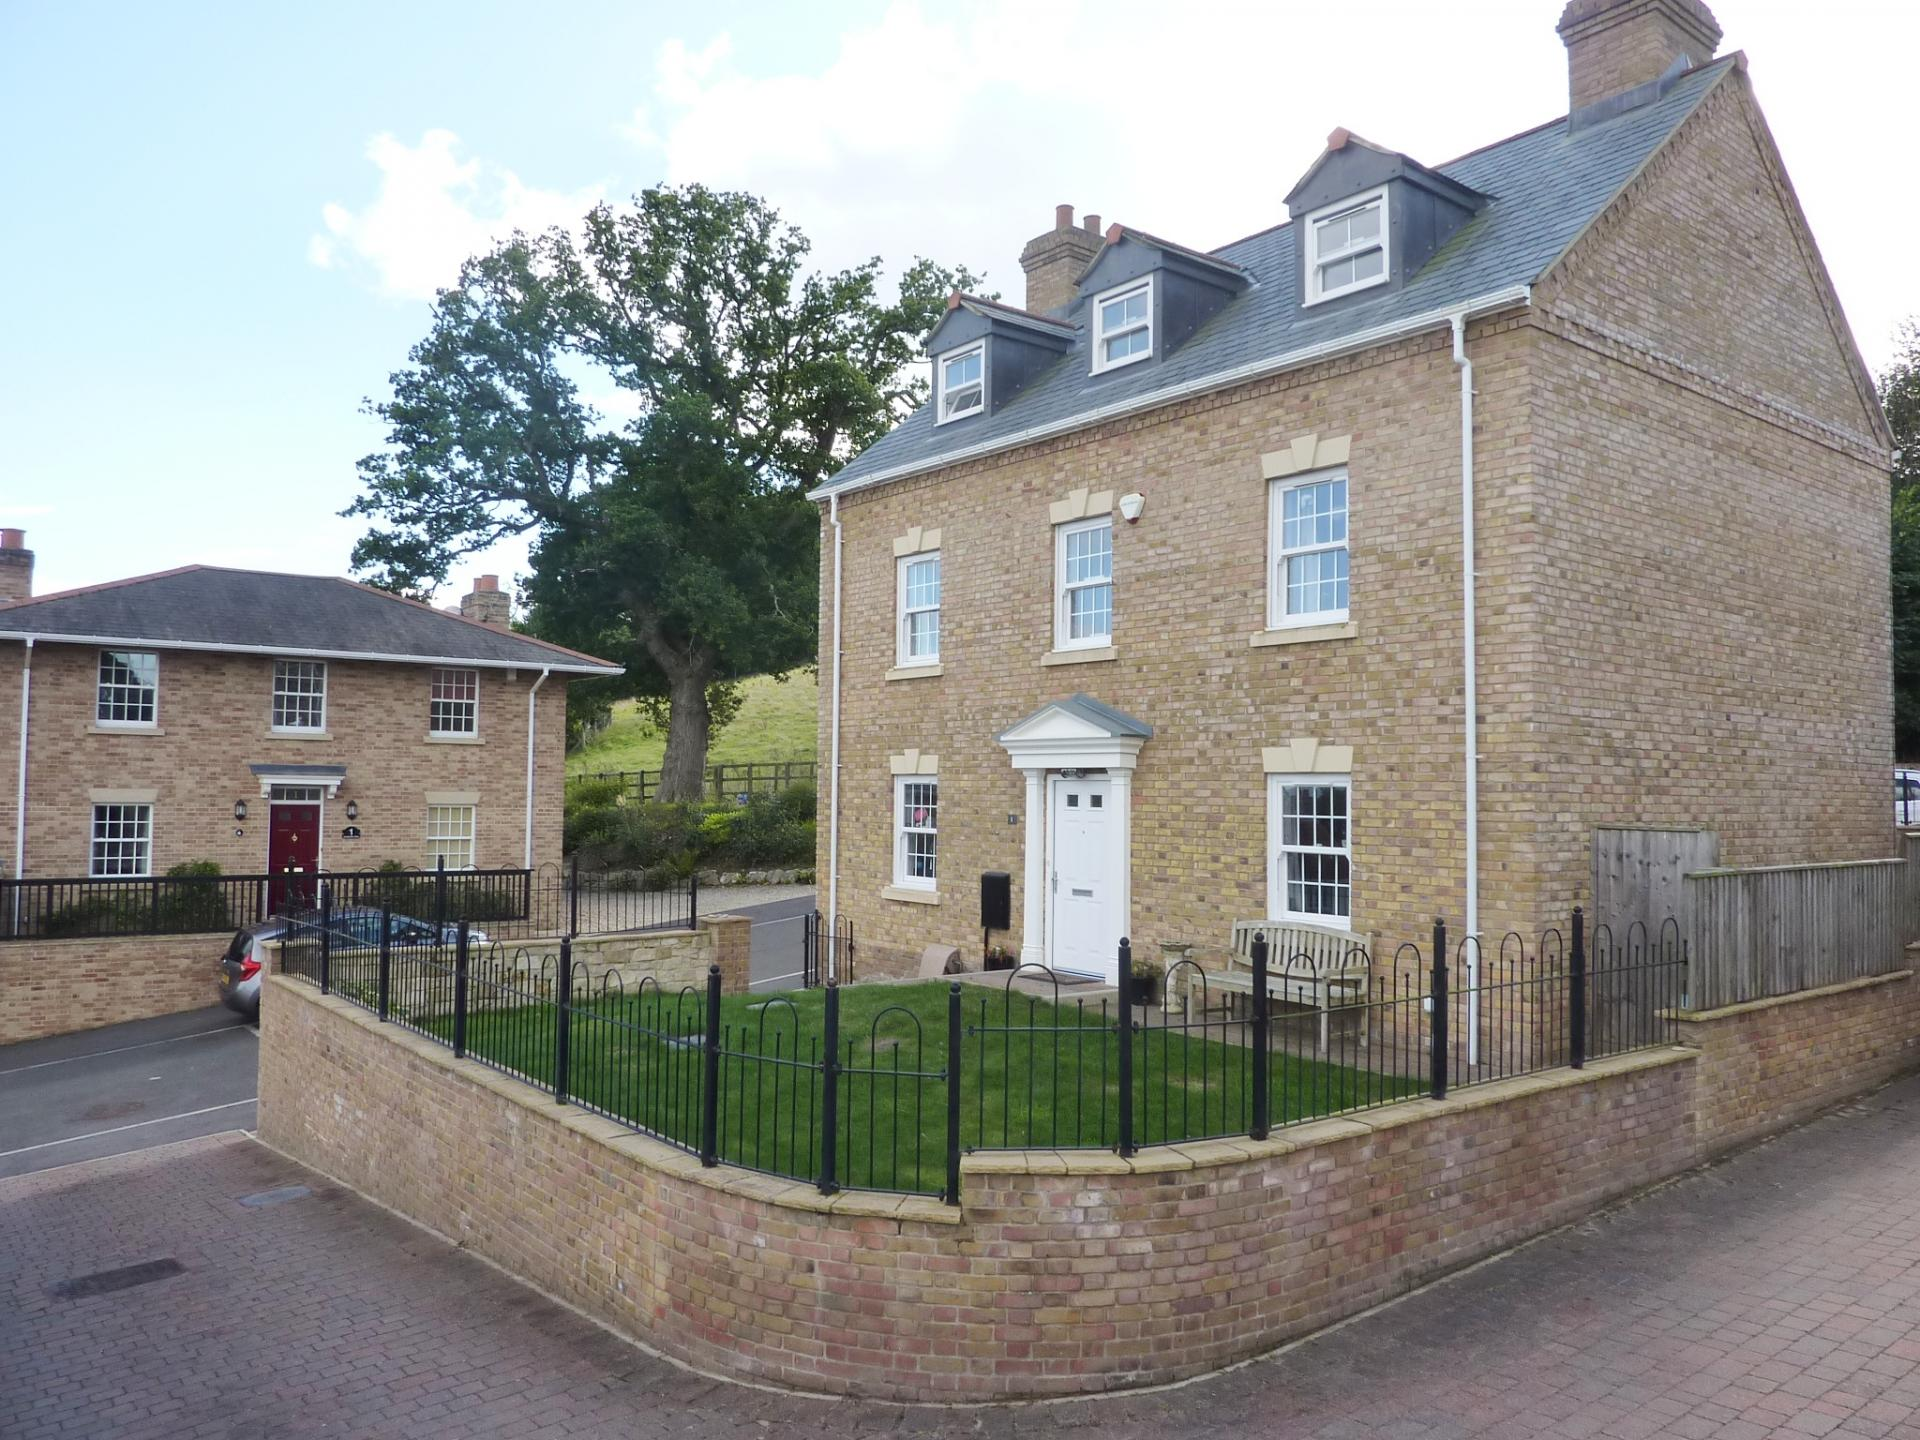 5 Bedrooms Detached House for sale in Lyme Regis